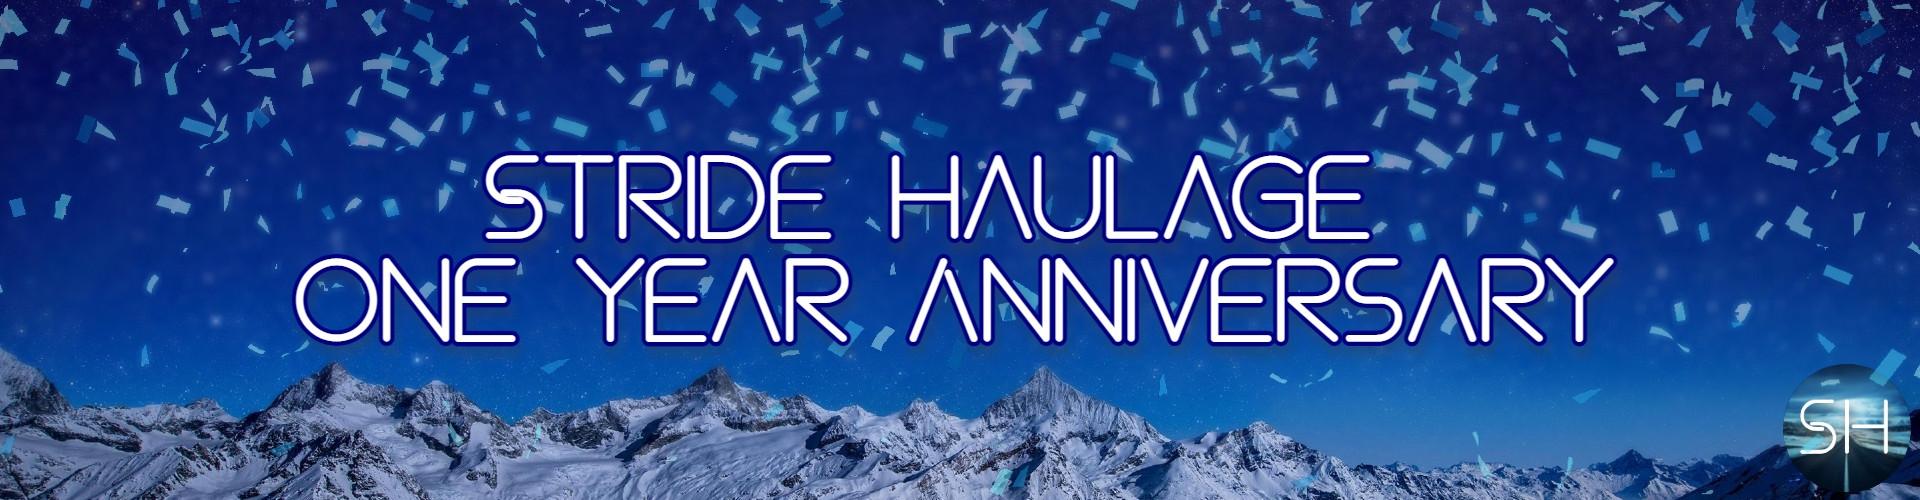 Stride Haulage™ ONE YEAR ANNIVERSARY!!